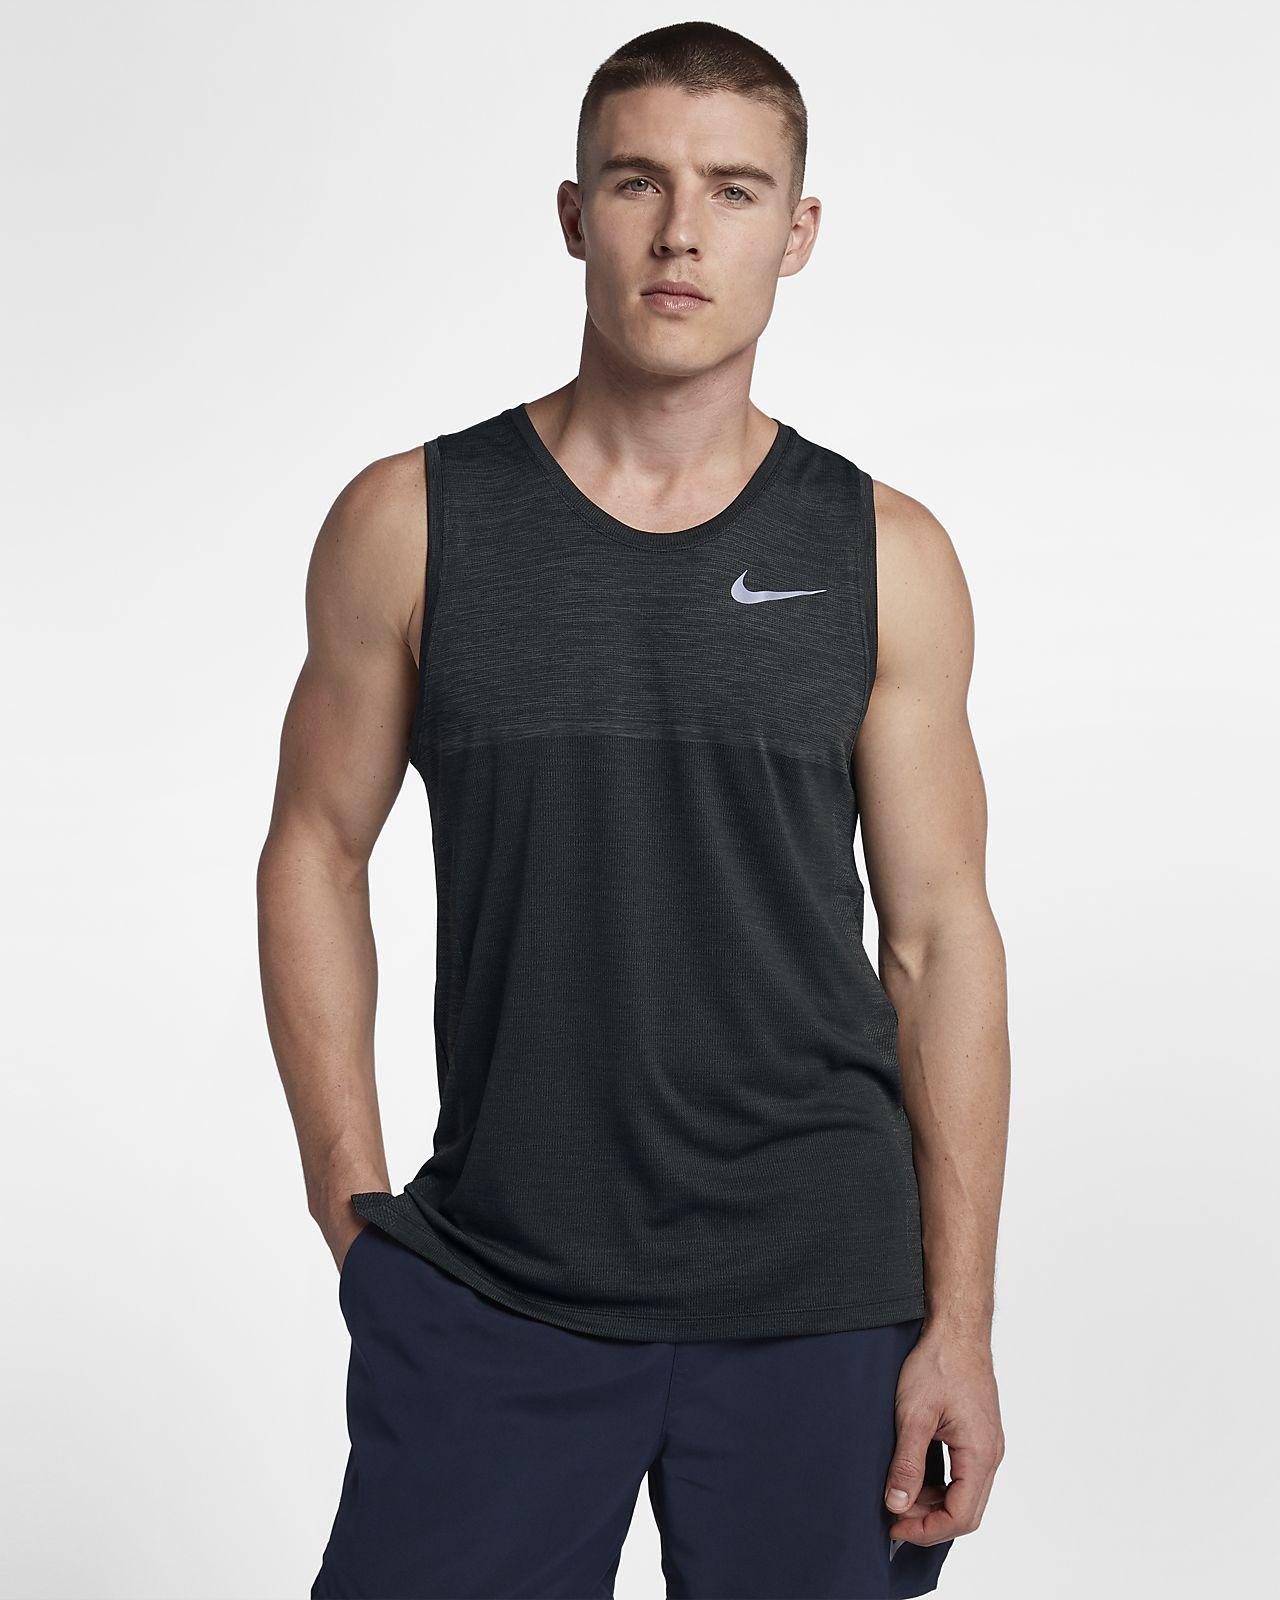 57a03d143910de Nike Dri-FIT Medalist Men s Running Tank